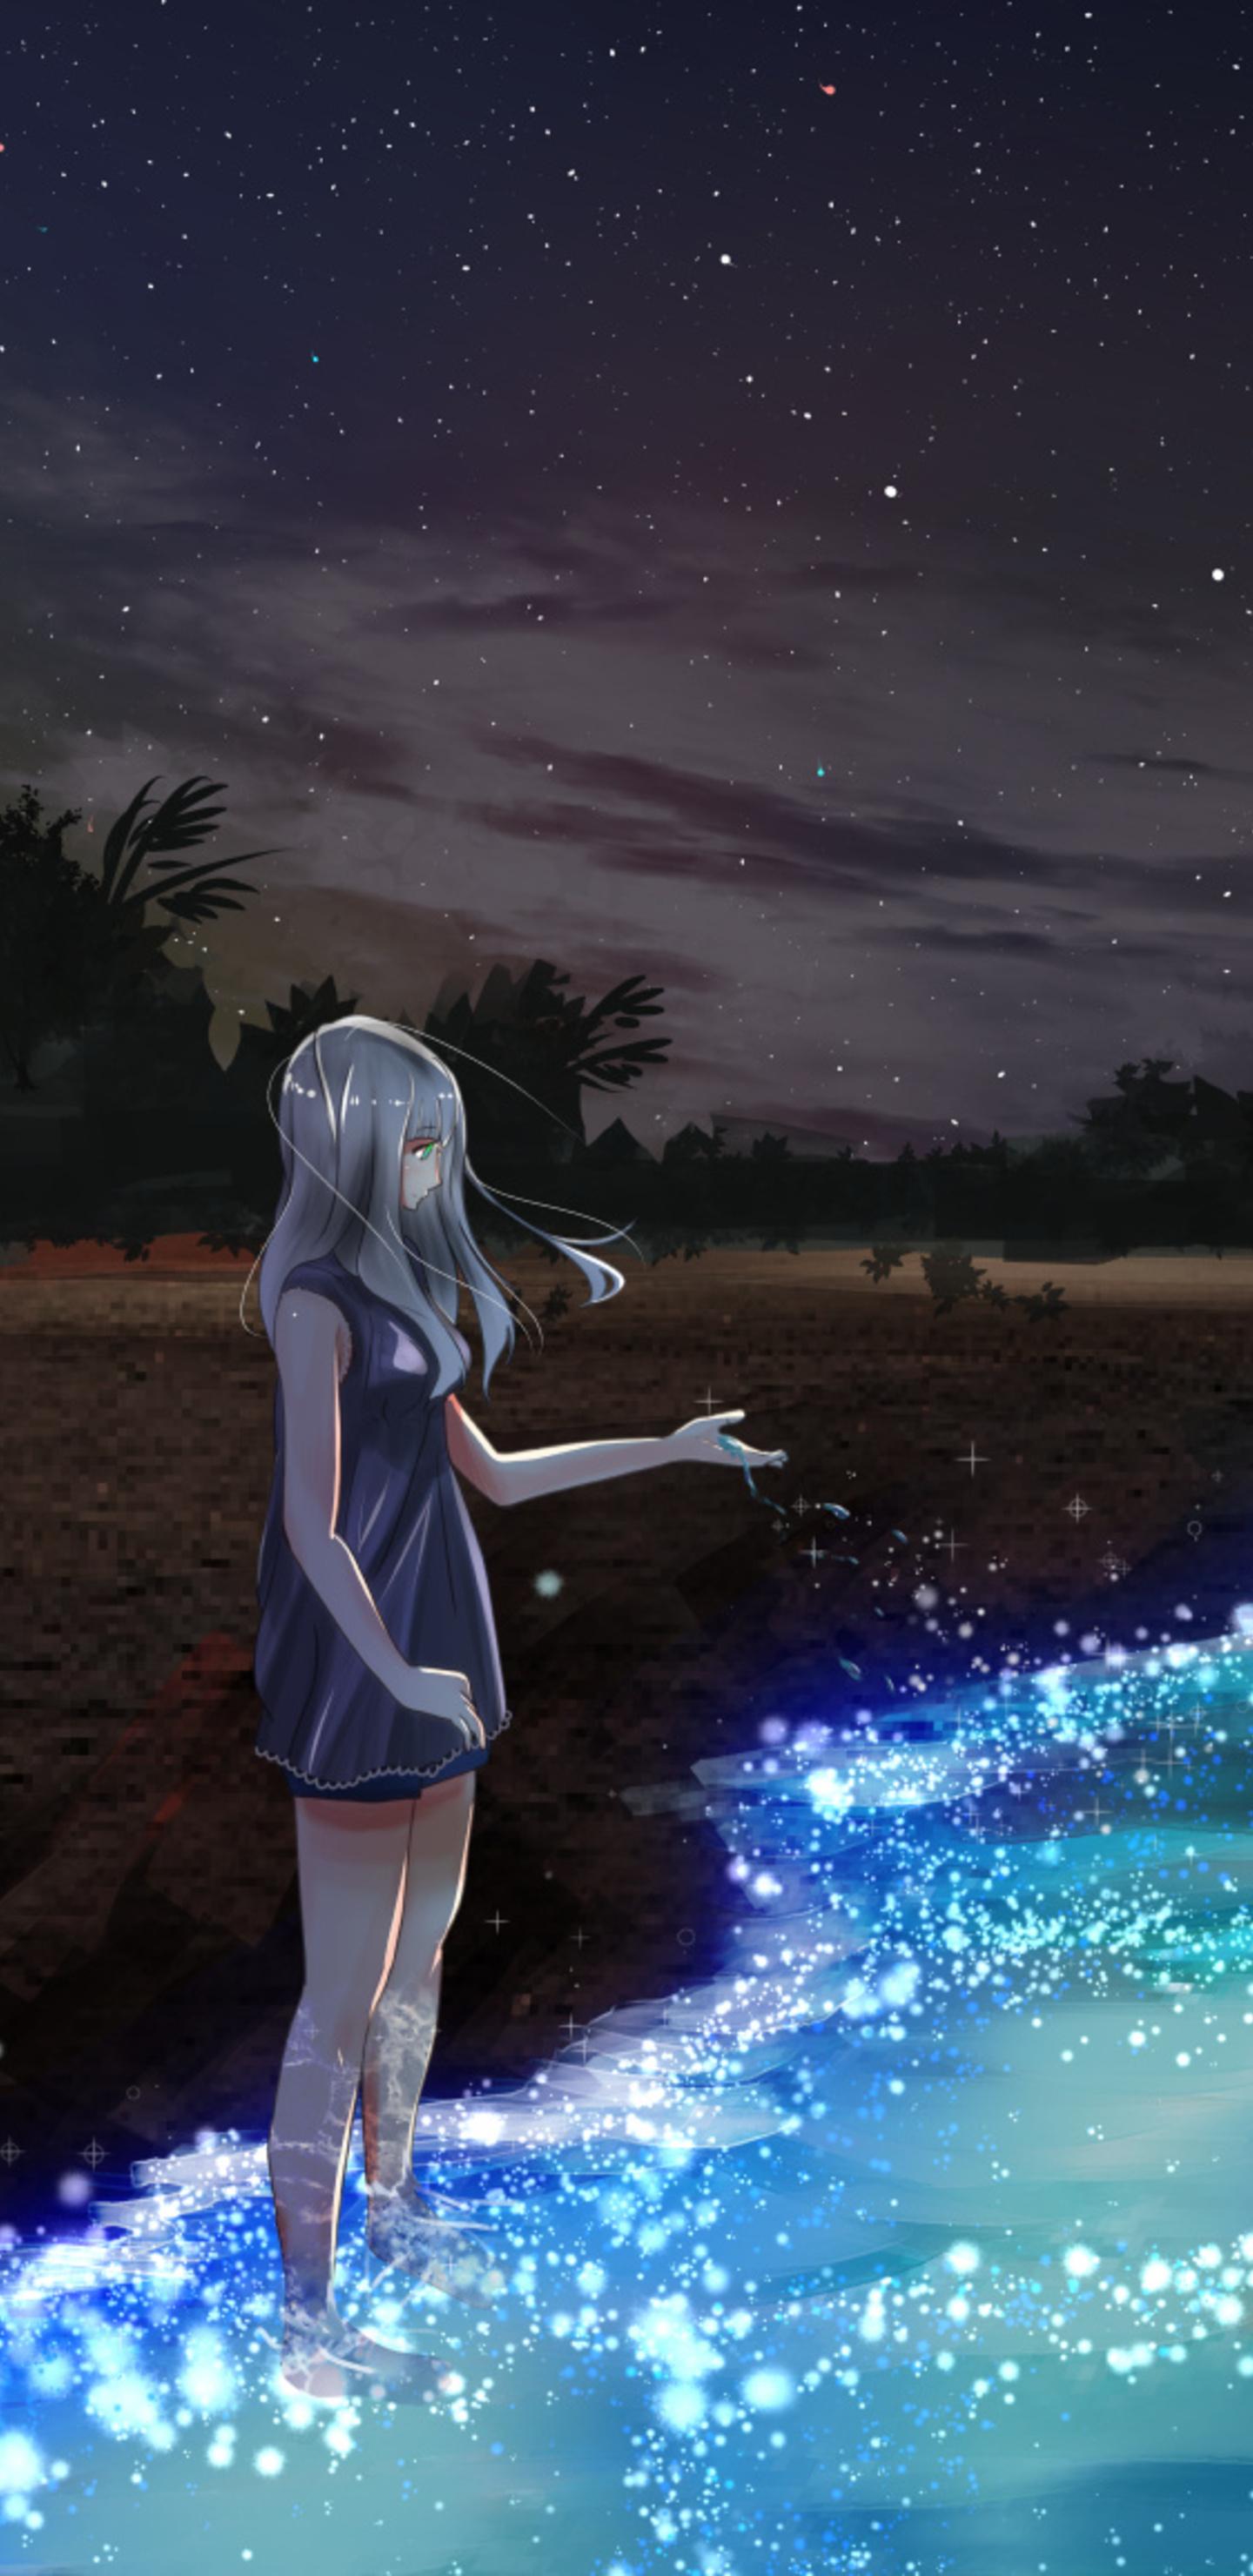 13 Anime Wallpaper Galaxy Girl